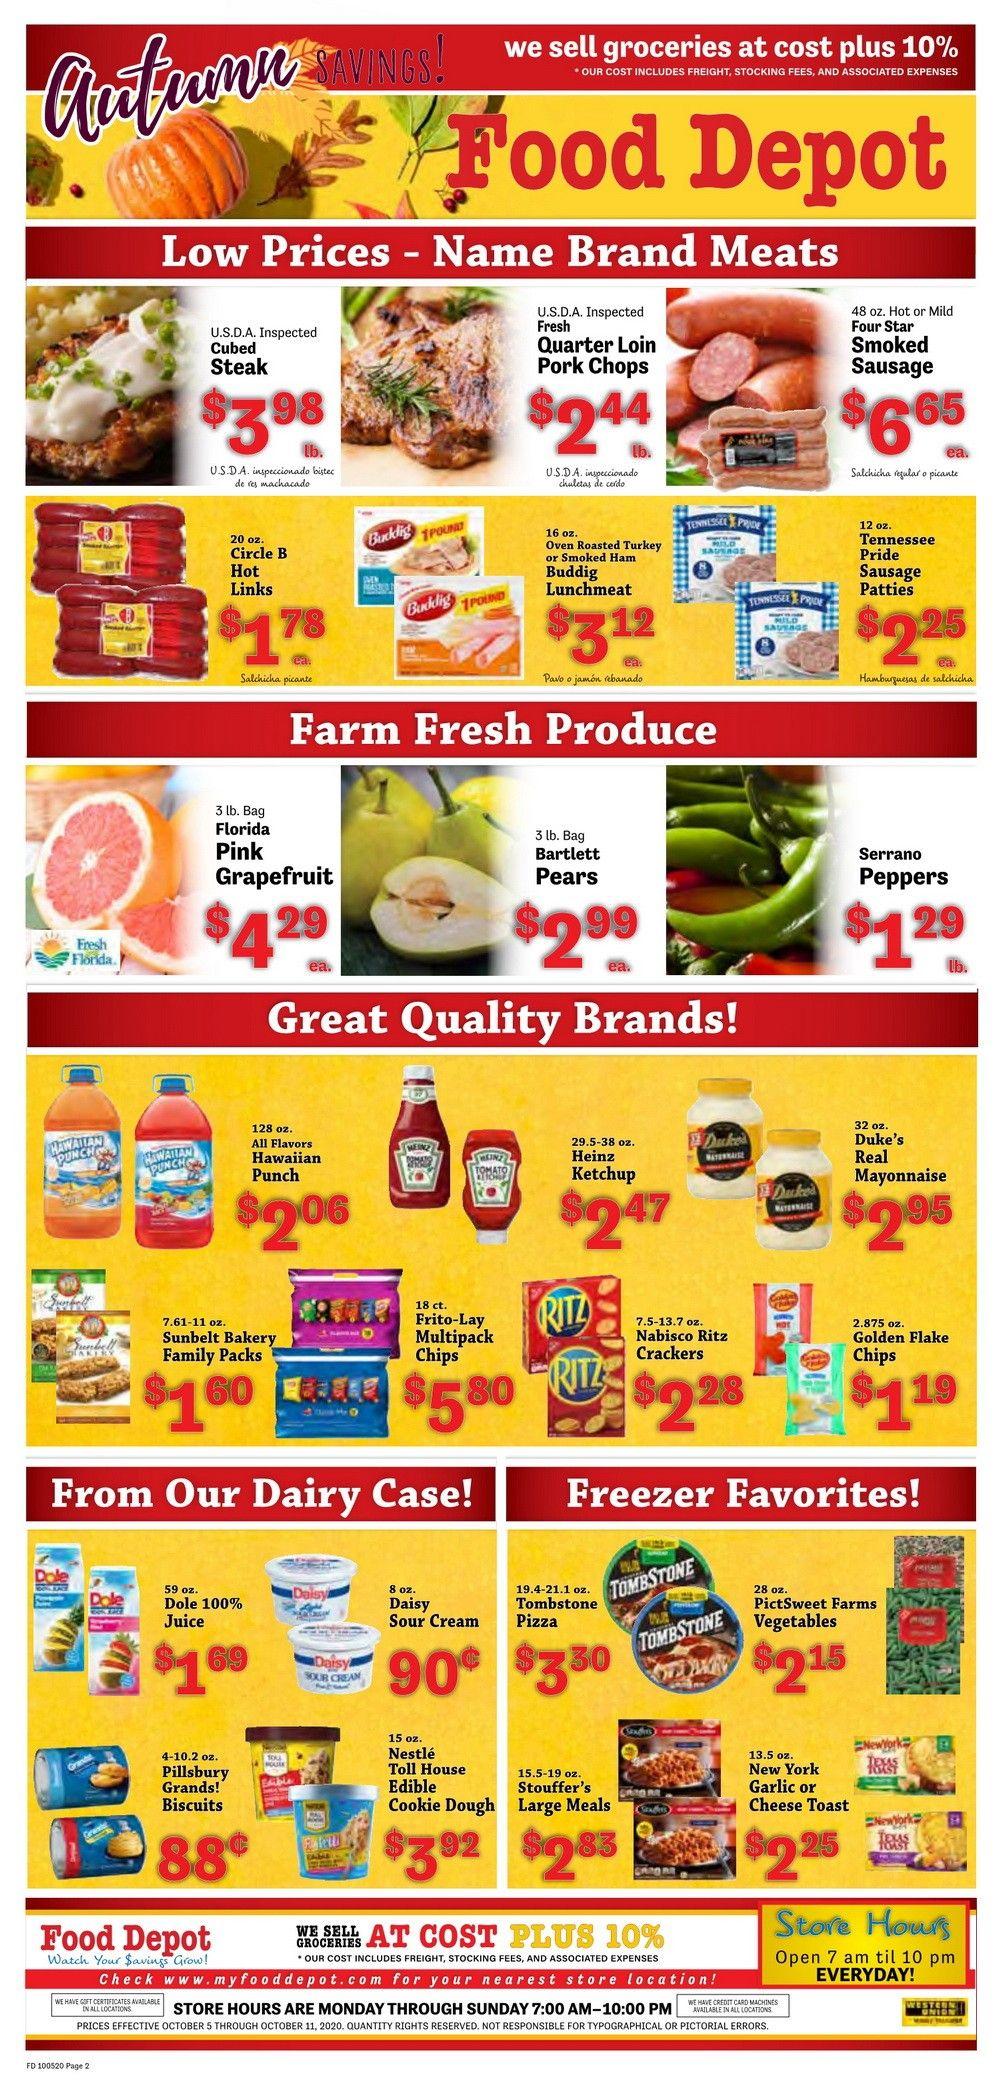 Food Depot Weekly Ad Oct 05 - Oct 11, 2020